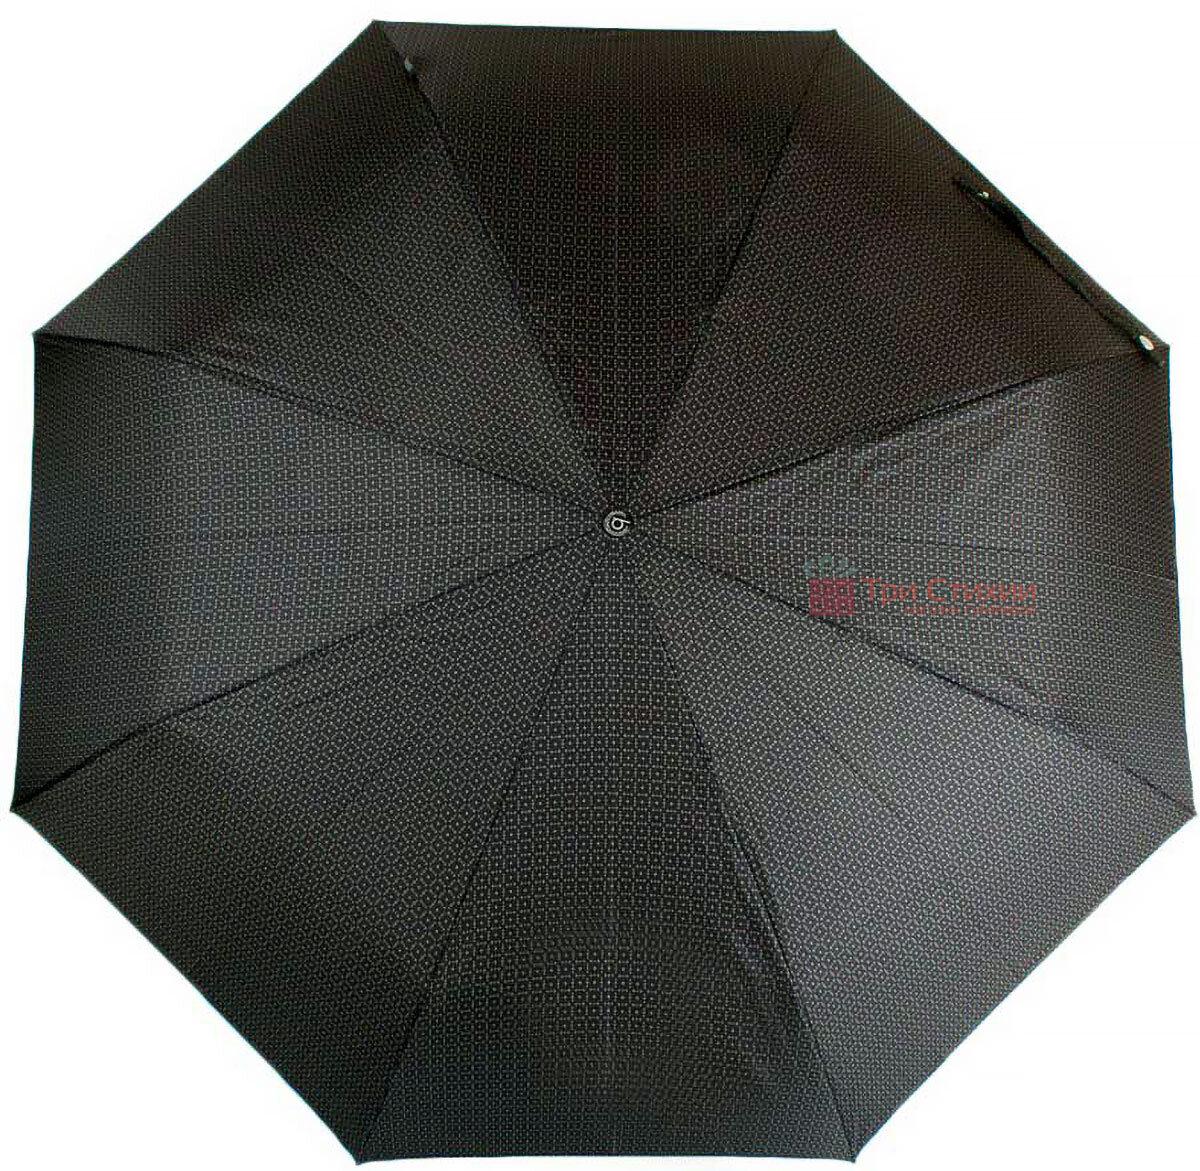 Зонт складной Bugatti 74667BU полный автомат Серый, фото 2